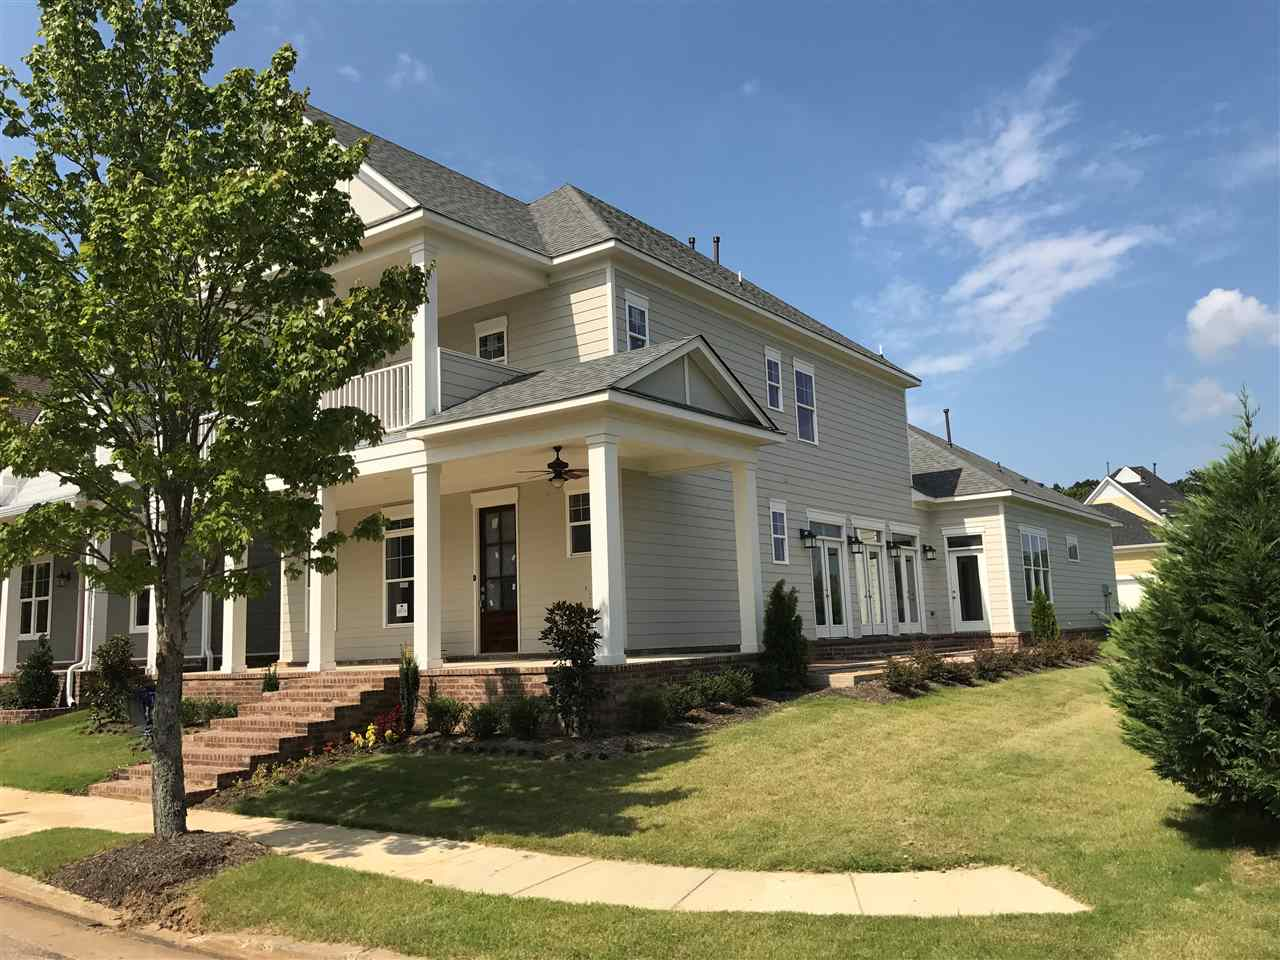 1257 Magilbra Memphis, TN 38016 - MLS #: 9998974